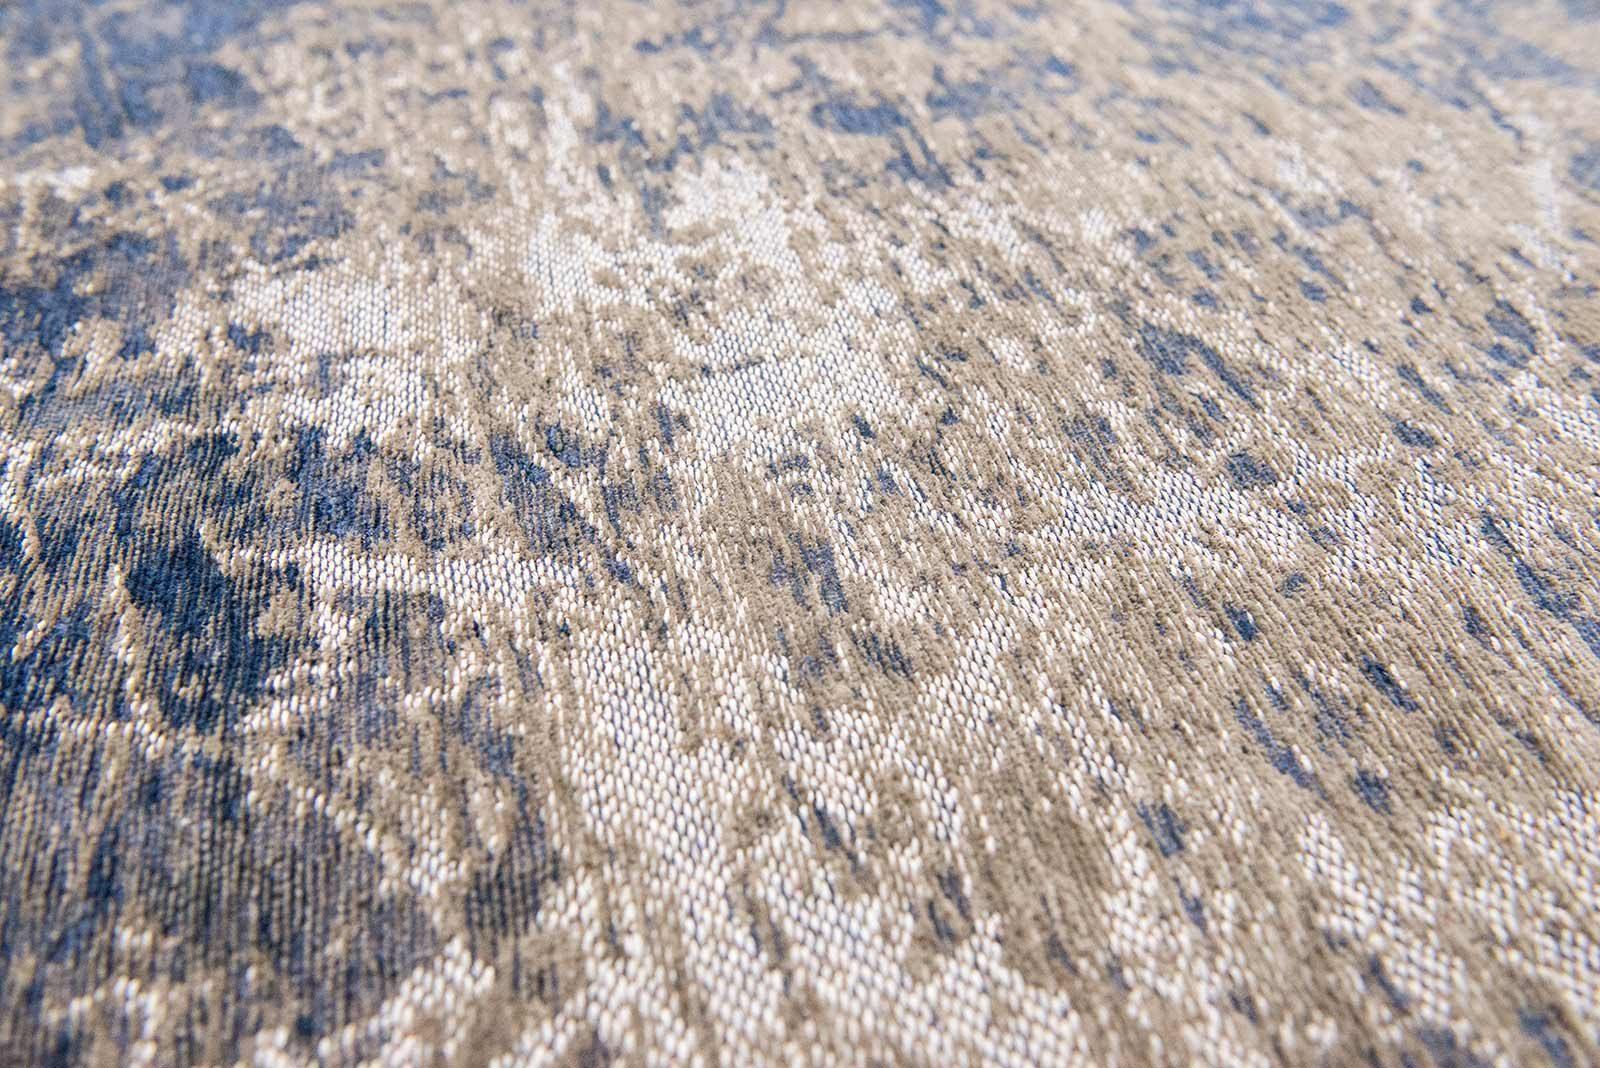 alfombras Louis De Poortere LX8629 Mad Men Cracks Abyss Blue zoom 2